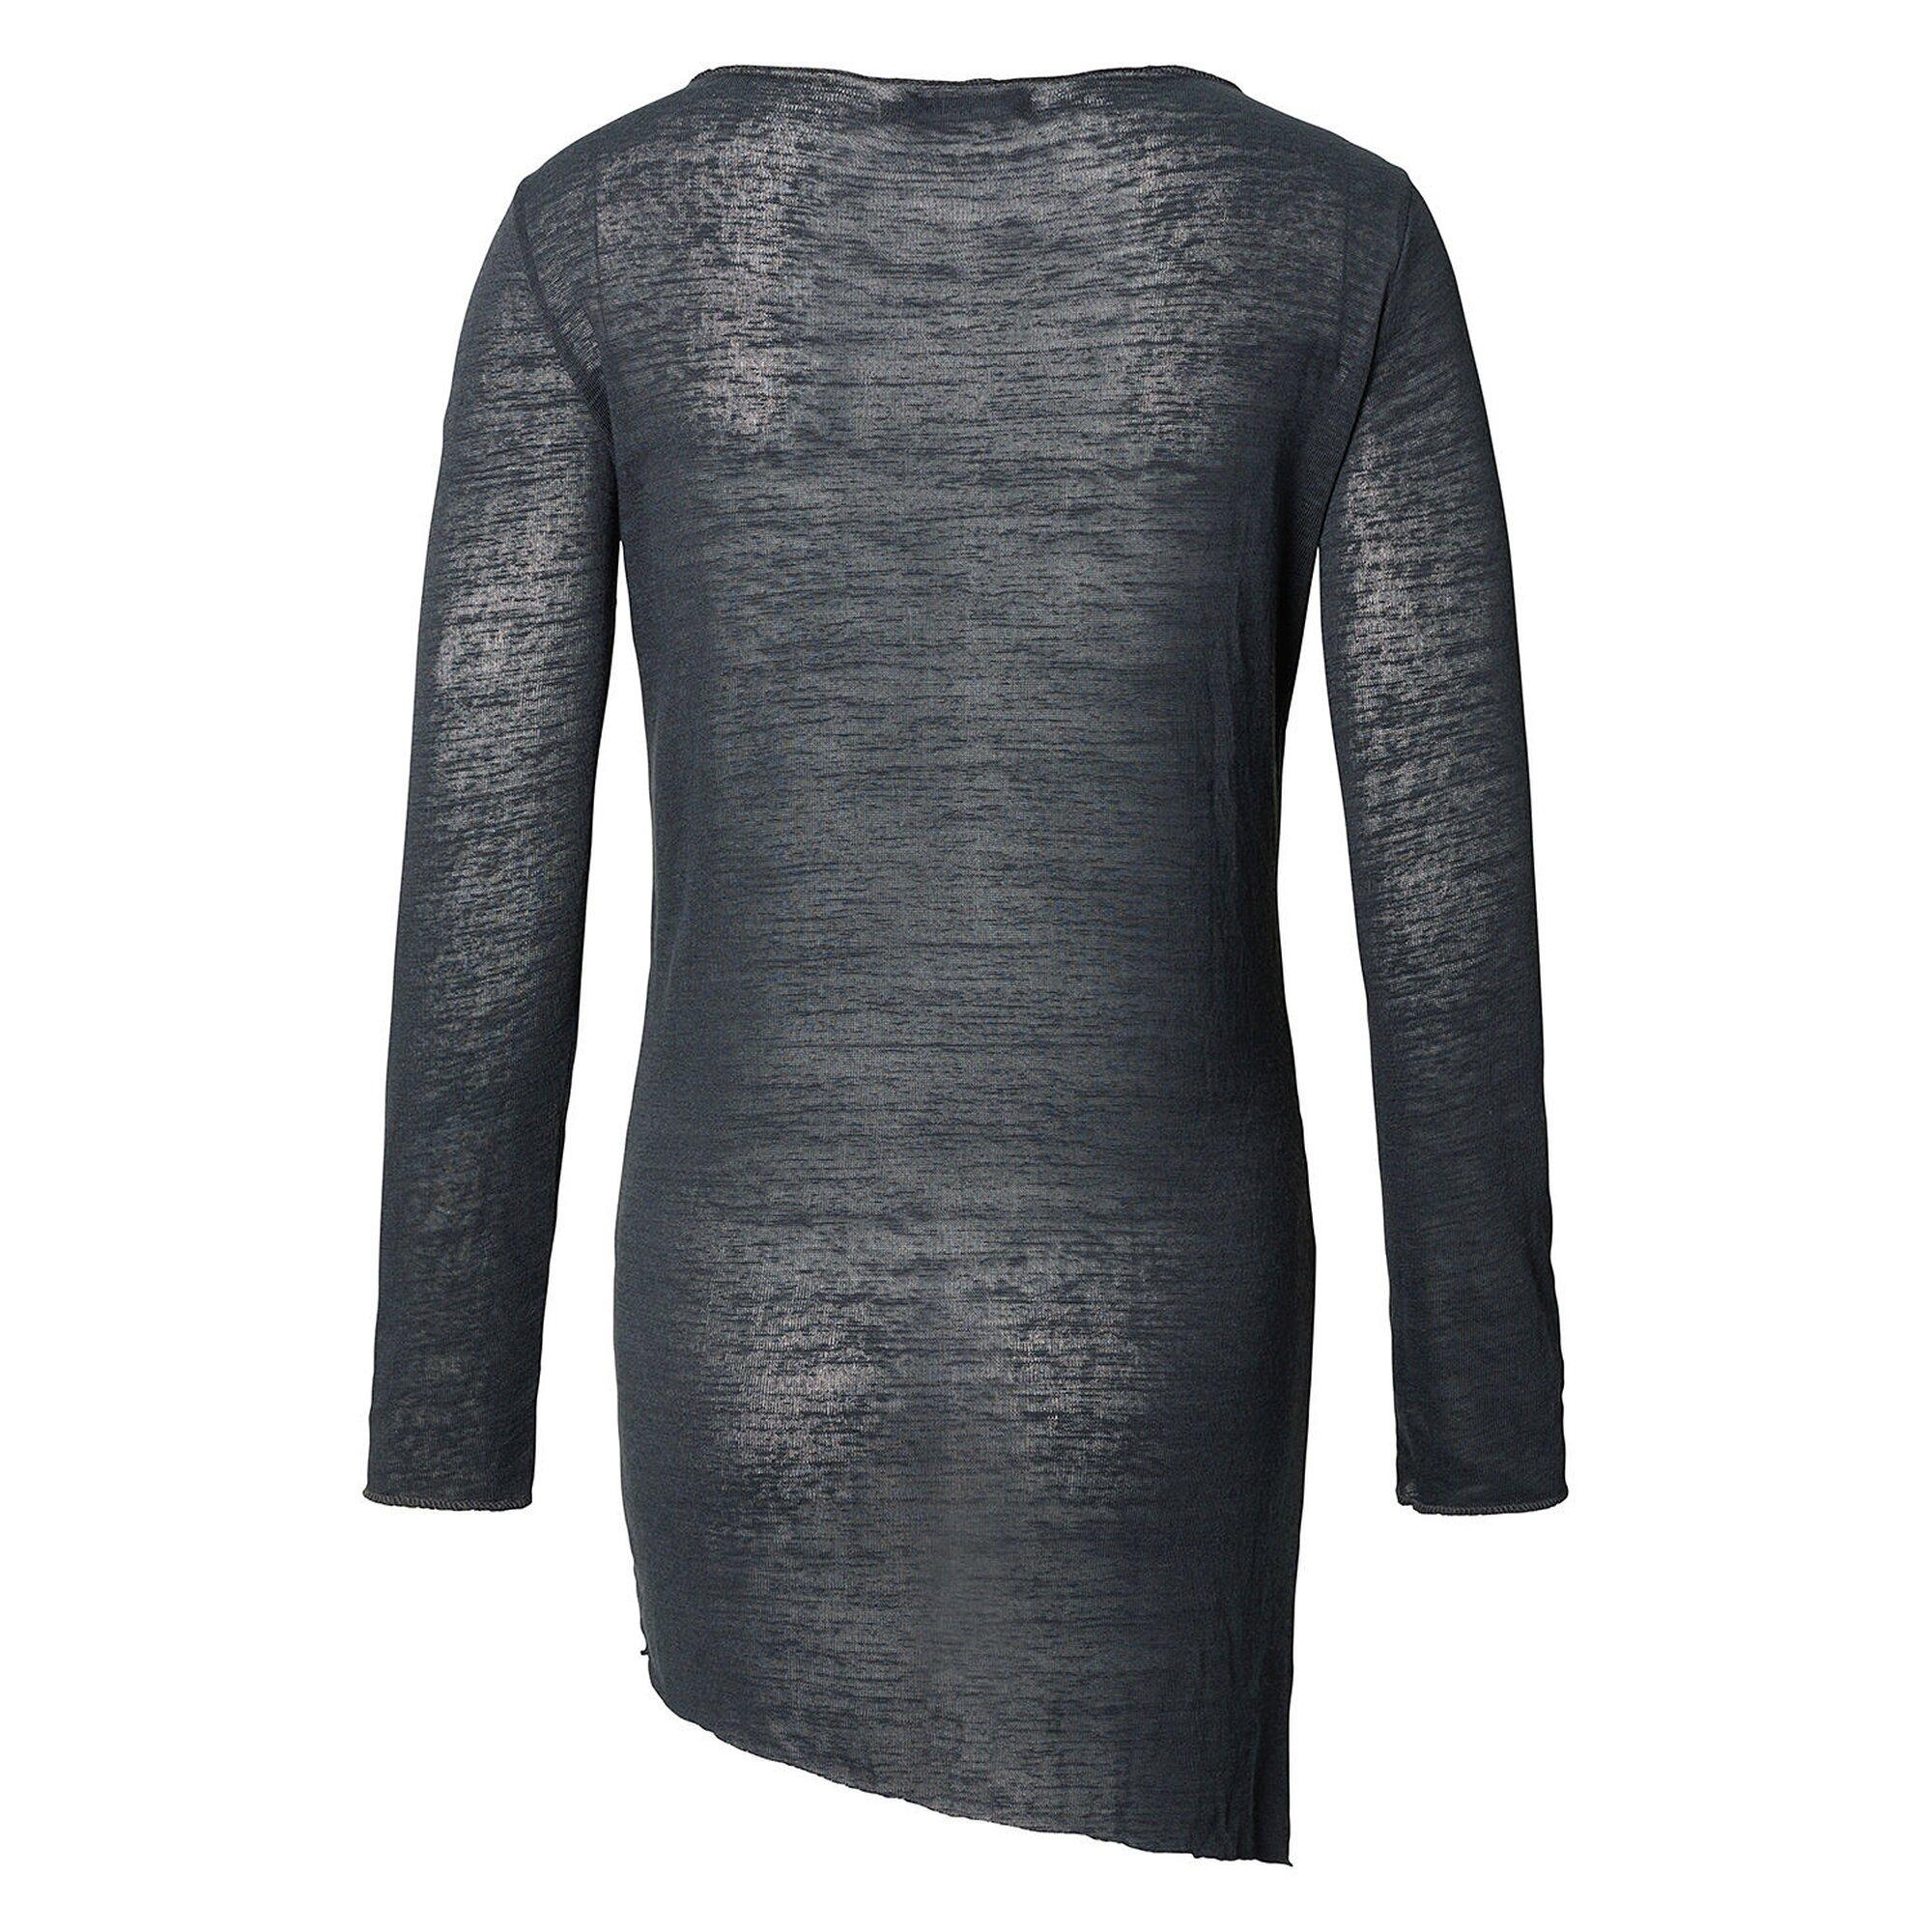 supermom-pullover-a-symetric